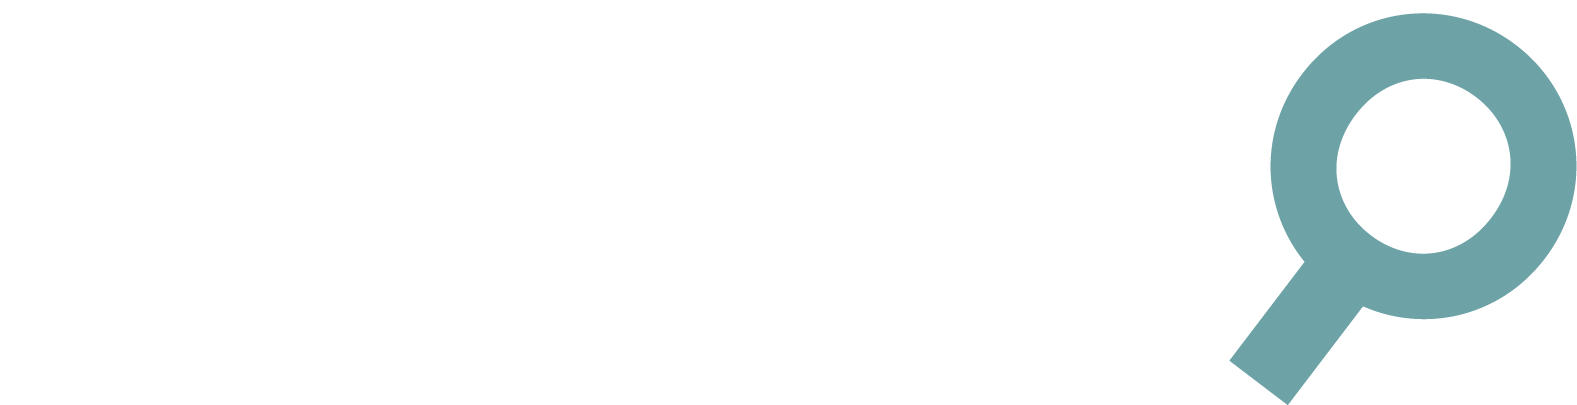 Creddo Logotype